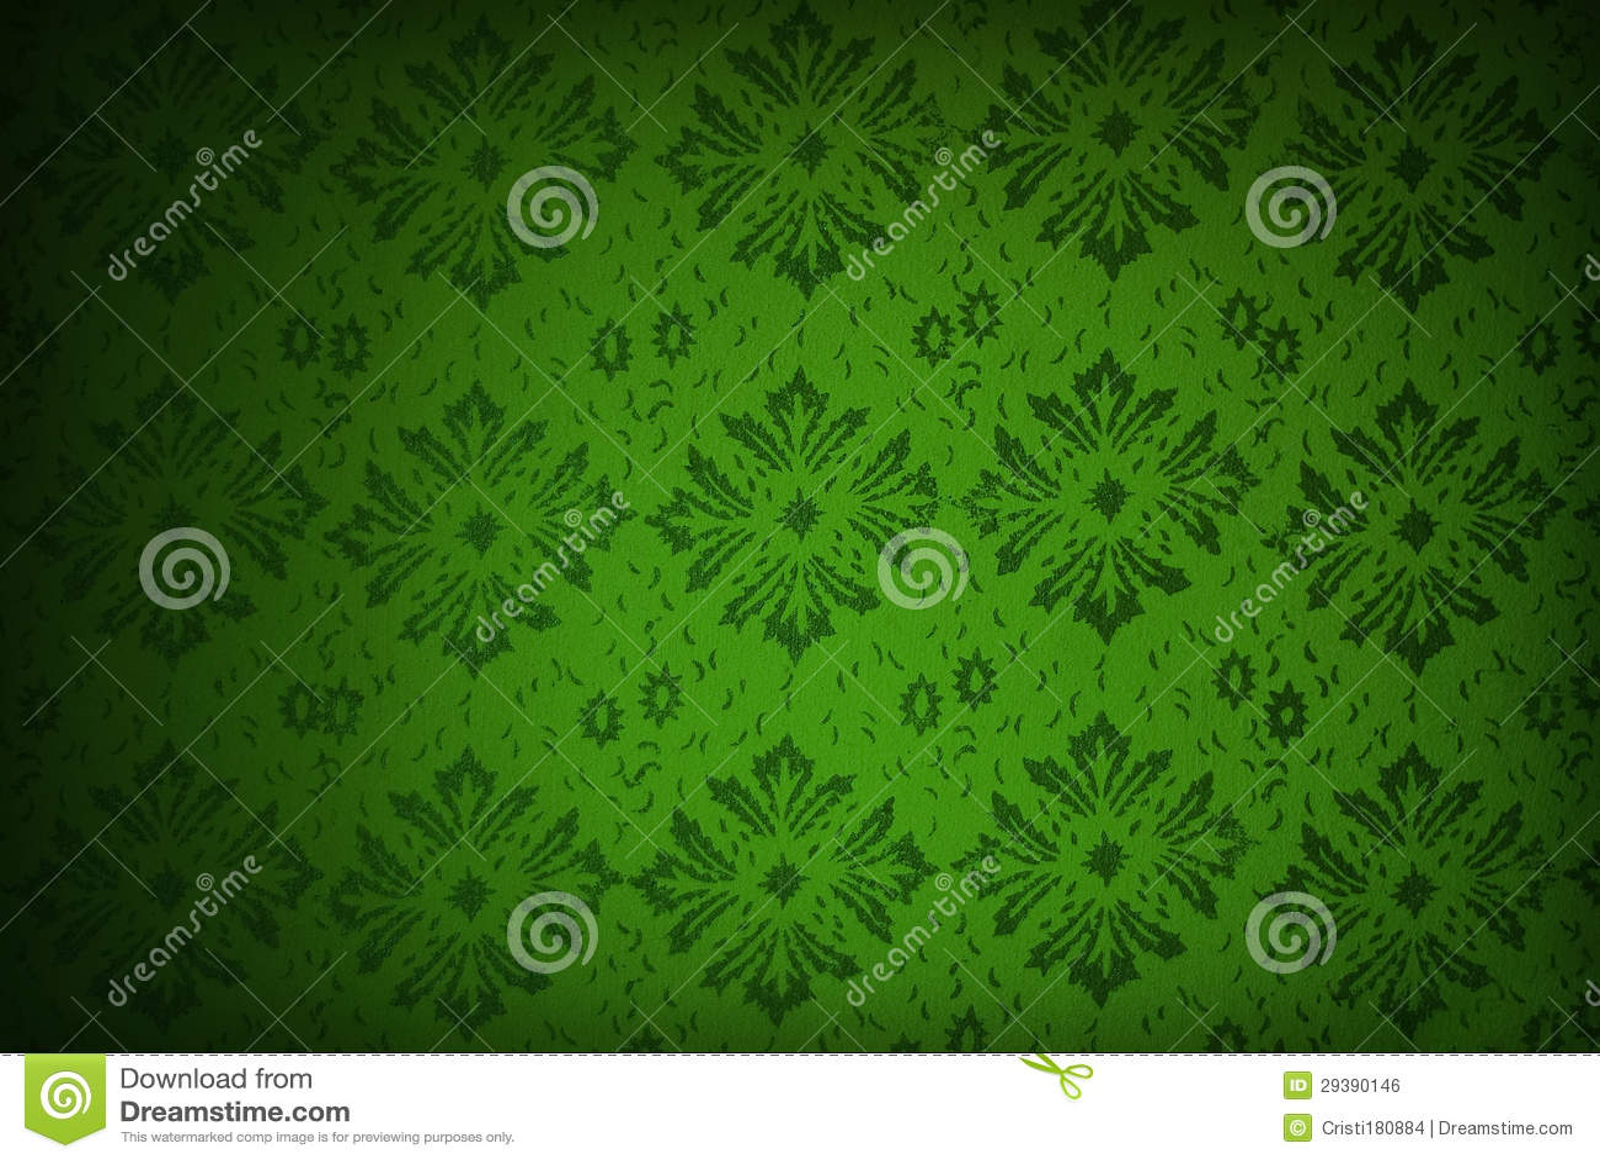 Carta da parati floreale verde immagini for Carta parati verde